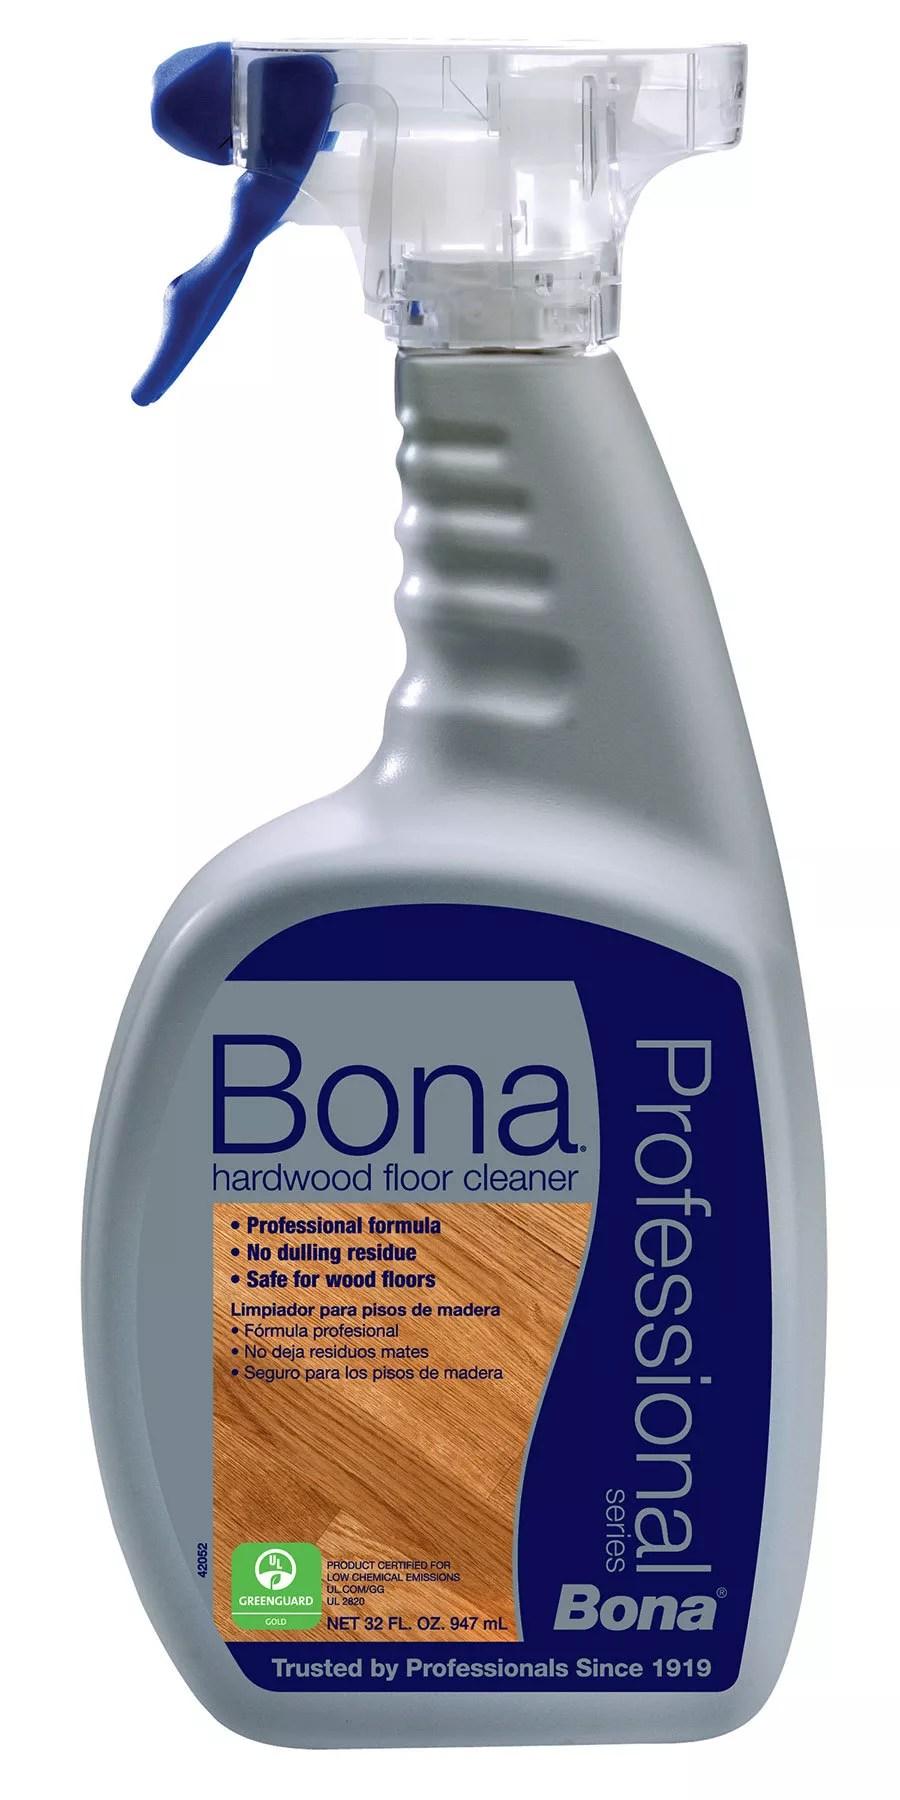 Bona Pro Series Hardwood Floor Cleaner Ready to Use